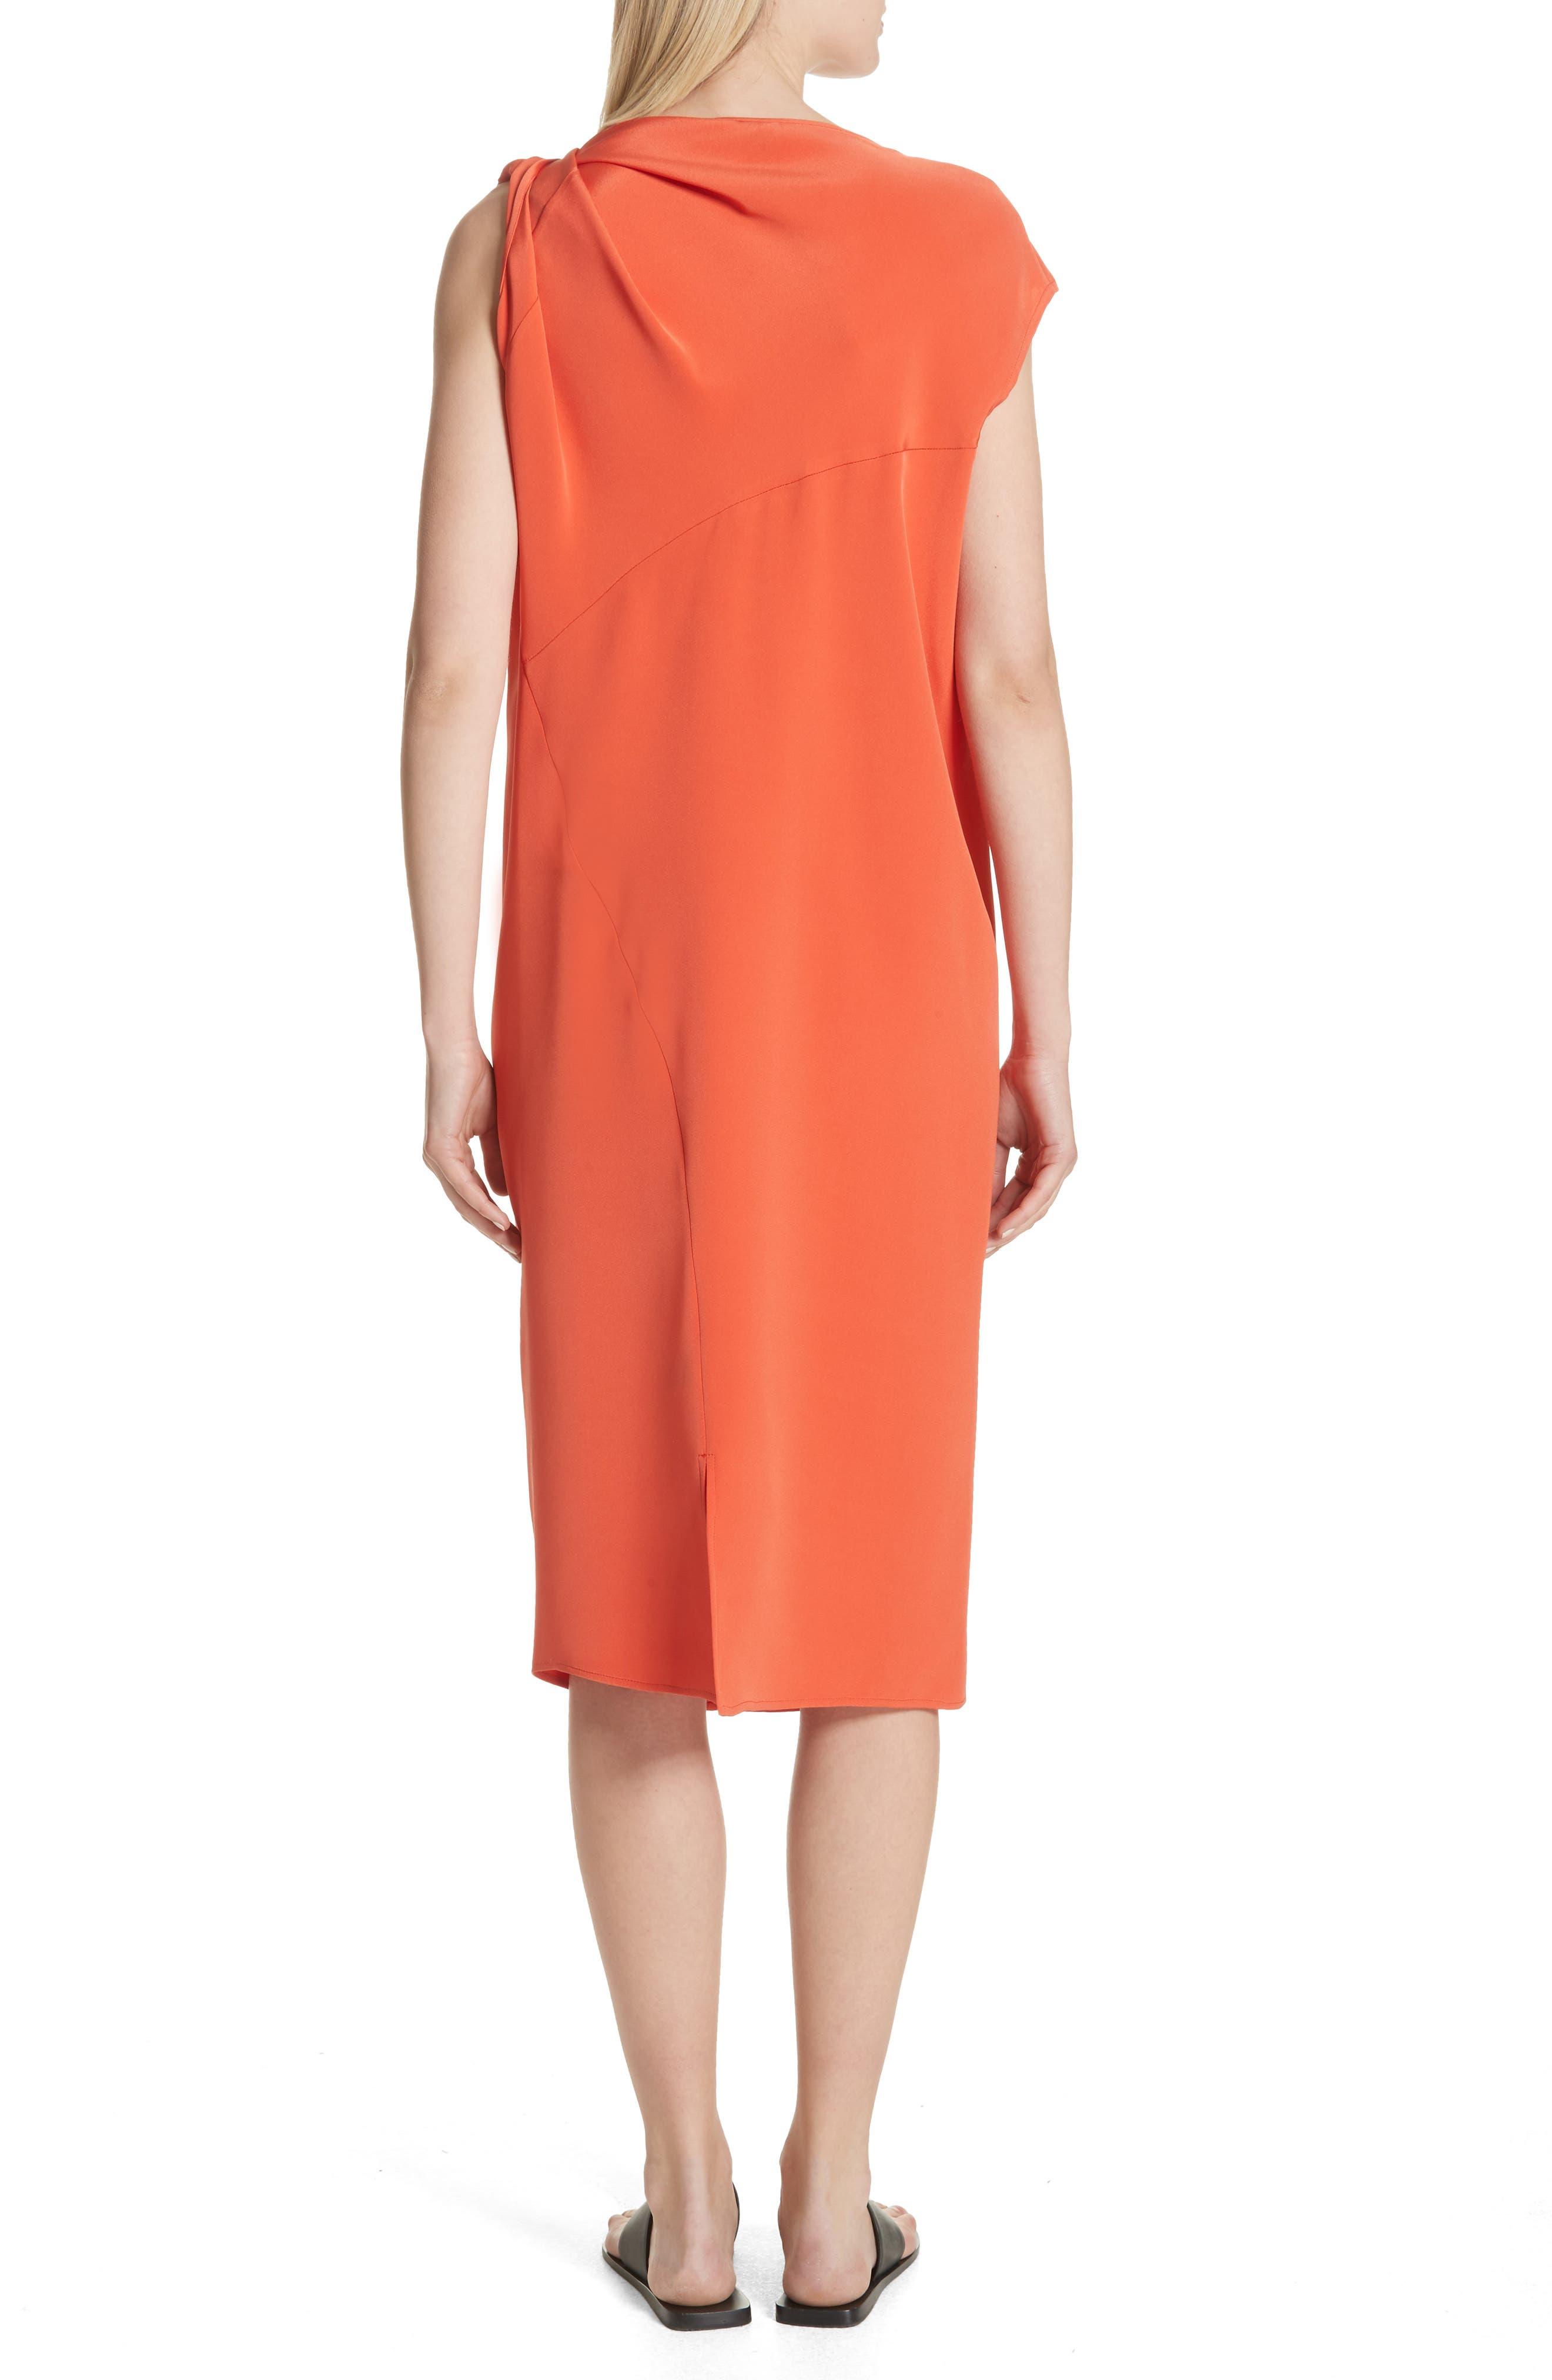 ZERO + MARIA CORNEJO,                             Twist Detail Silk Dress,                             Alternate thumbnail 2, color,                             840